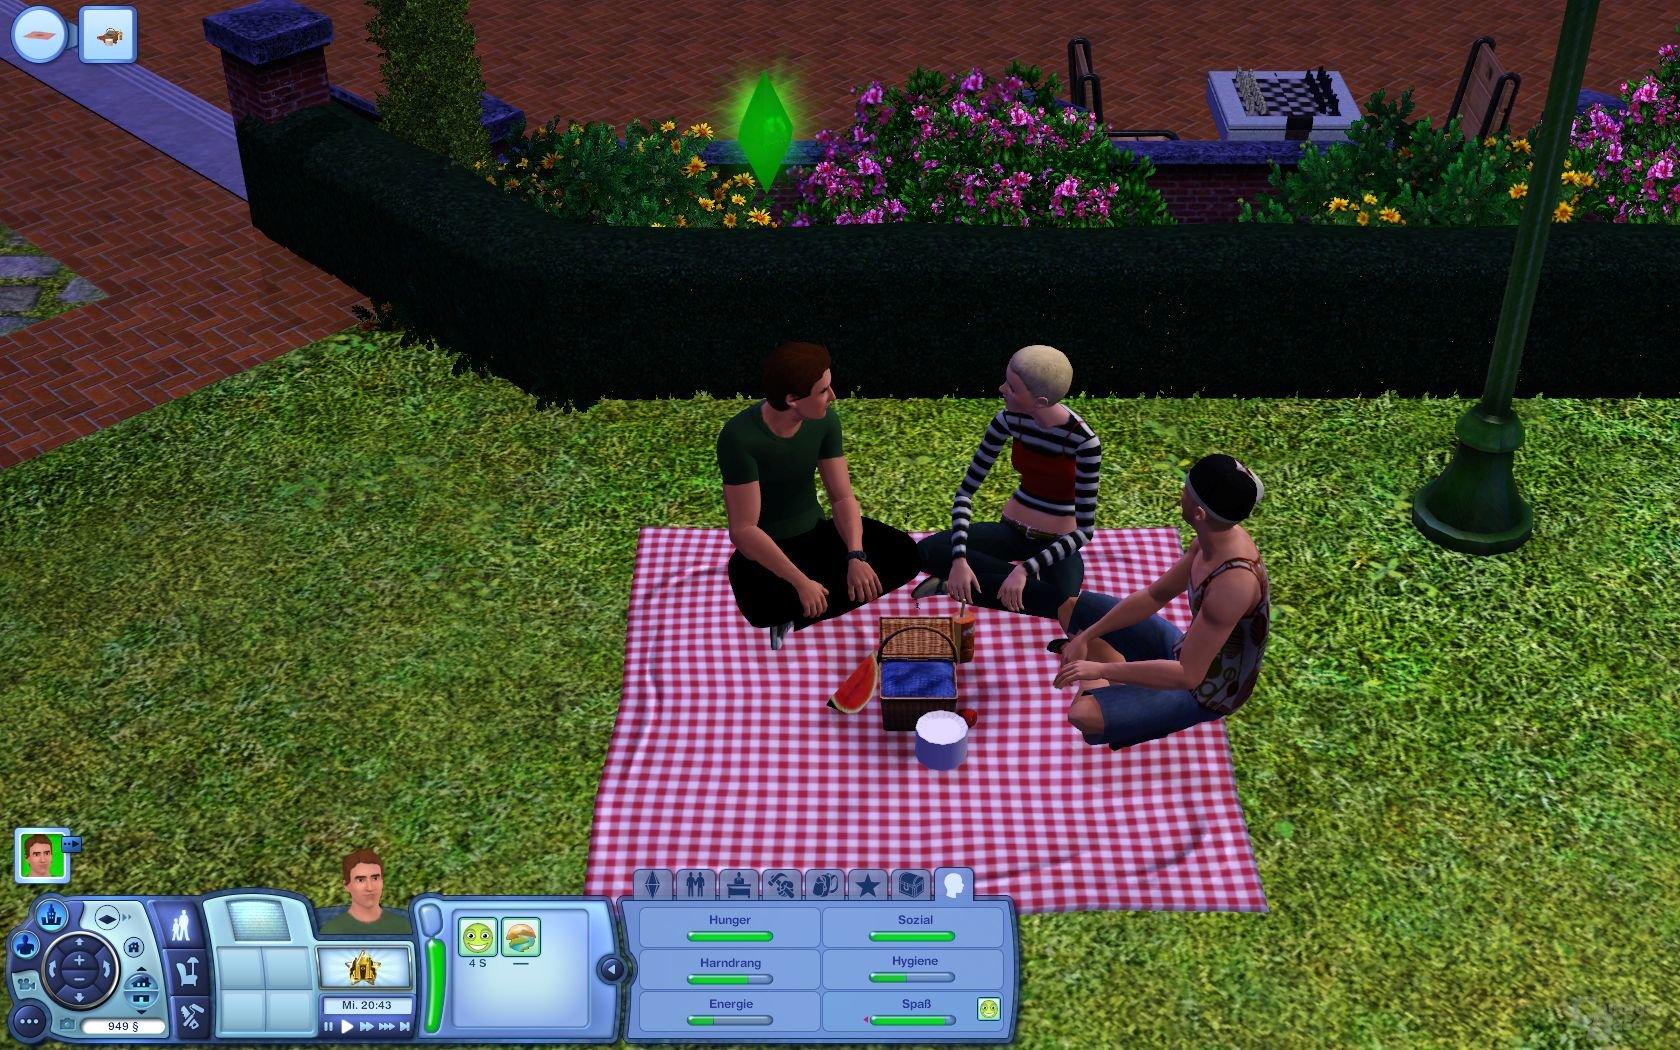 Die Sims 3 - Soziale Interaktion